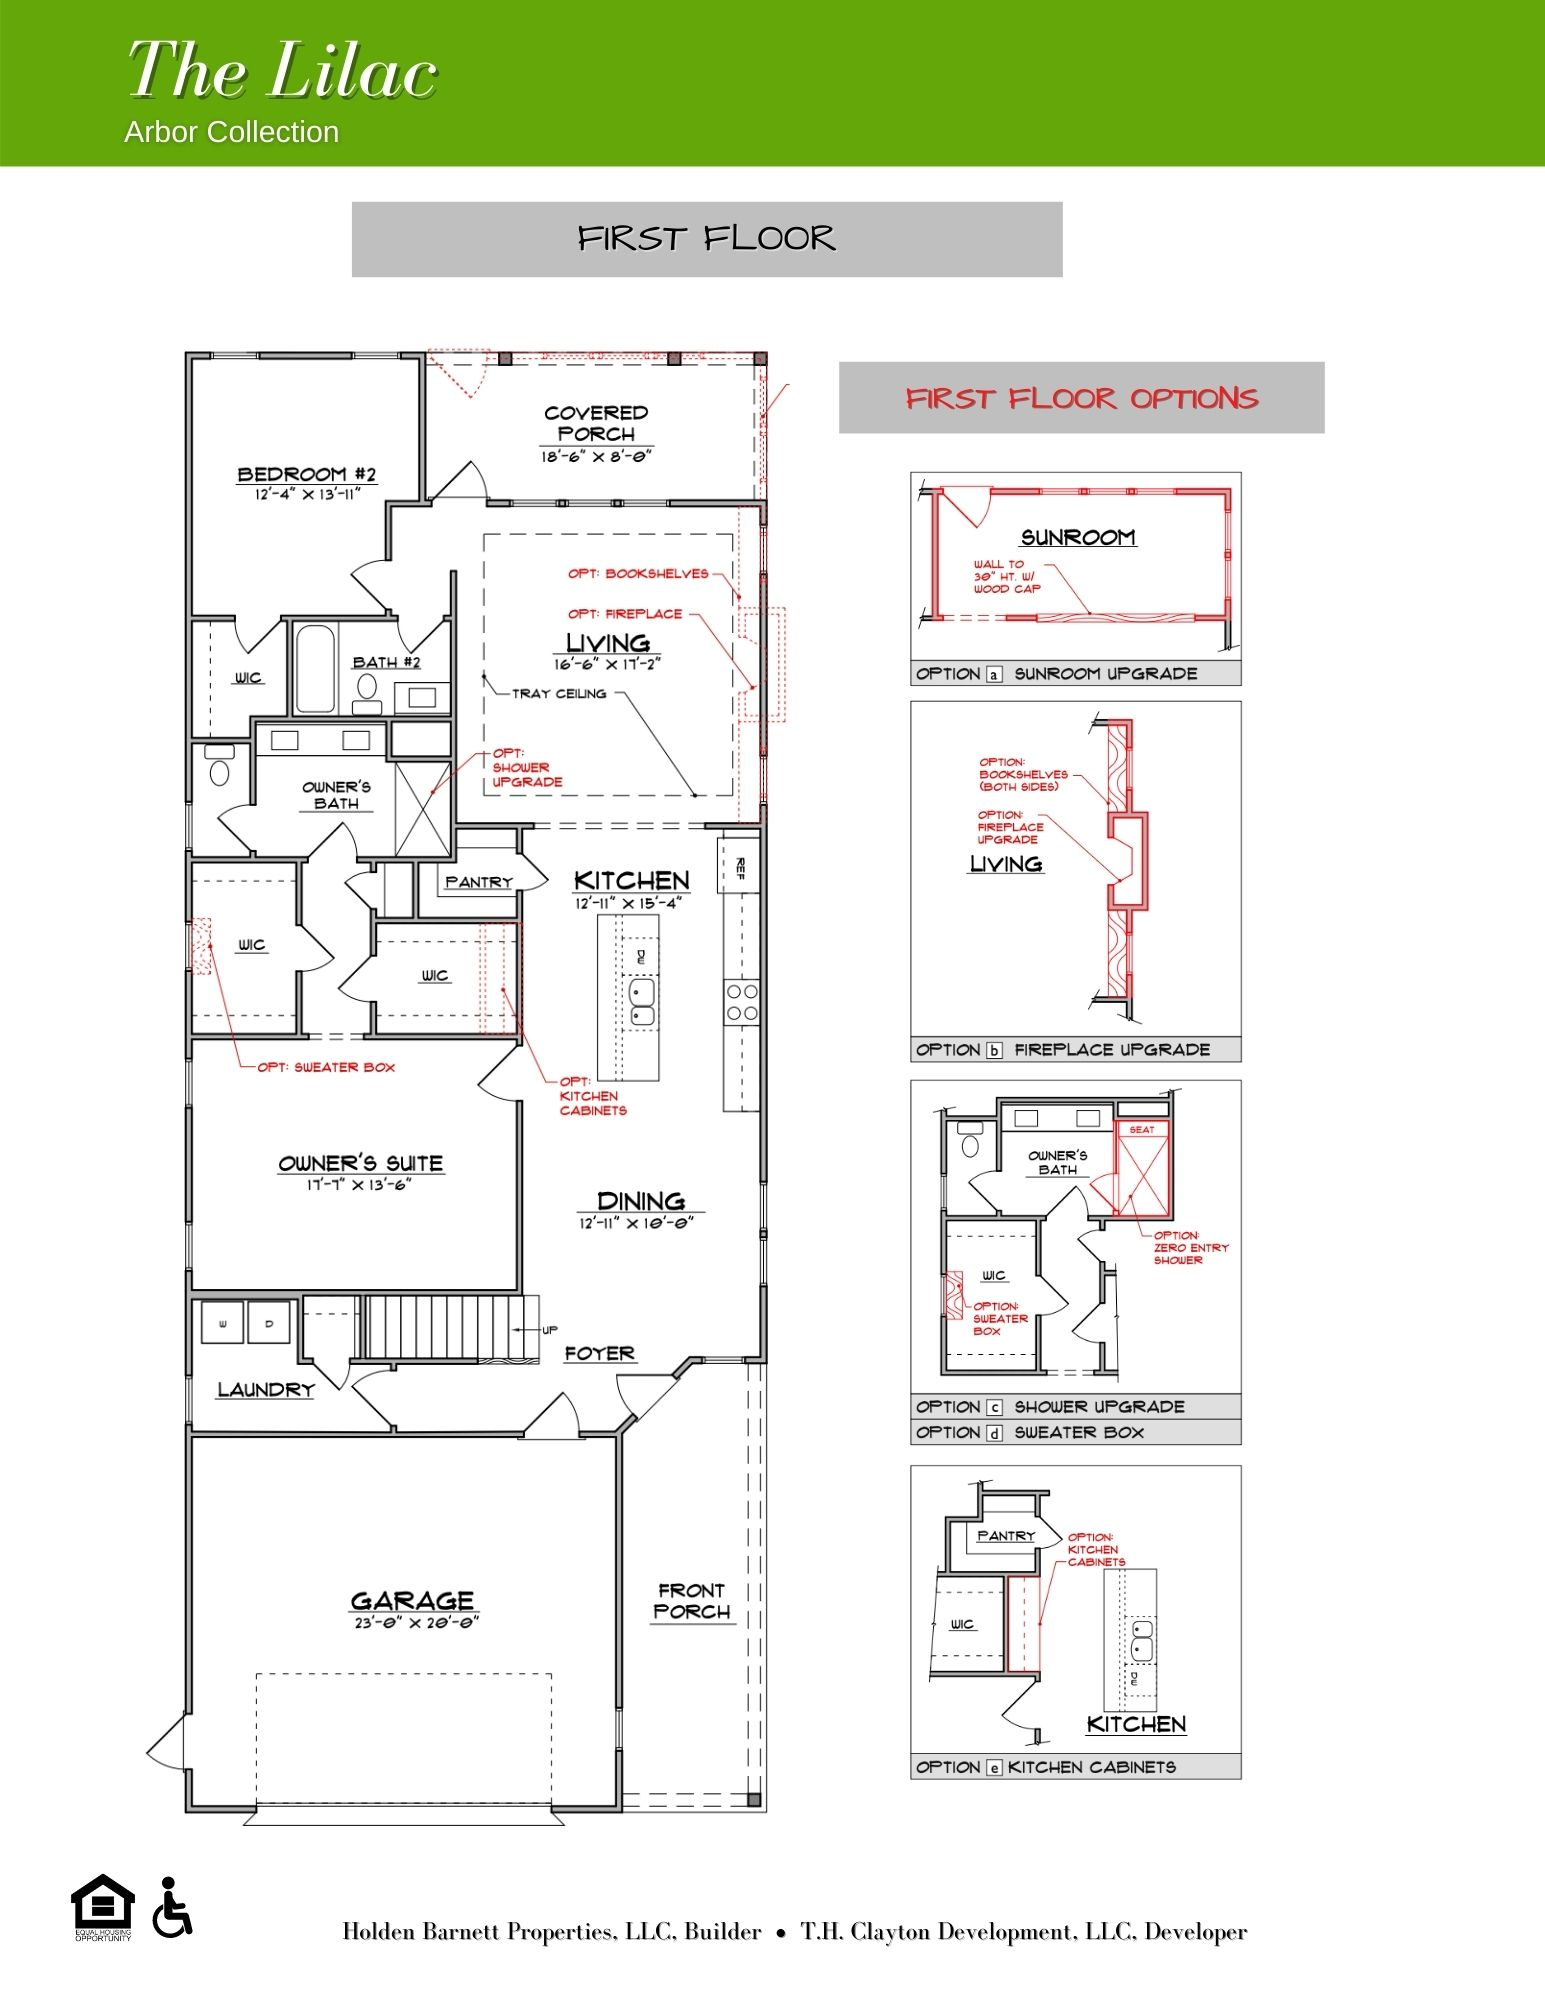 The Lilac First Floor Floorplan